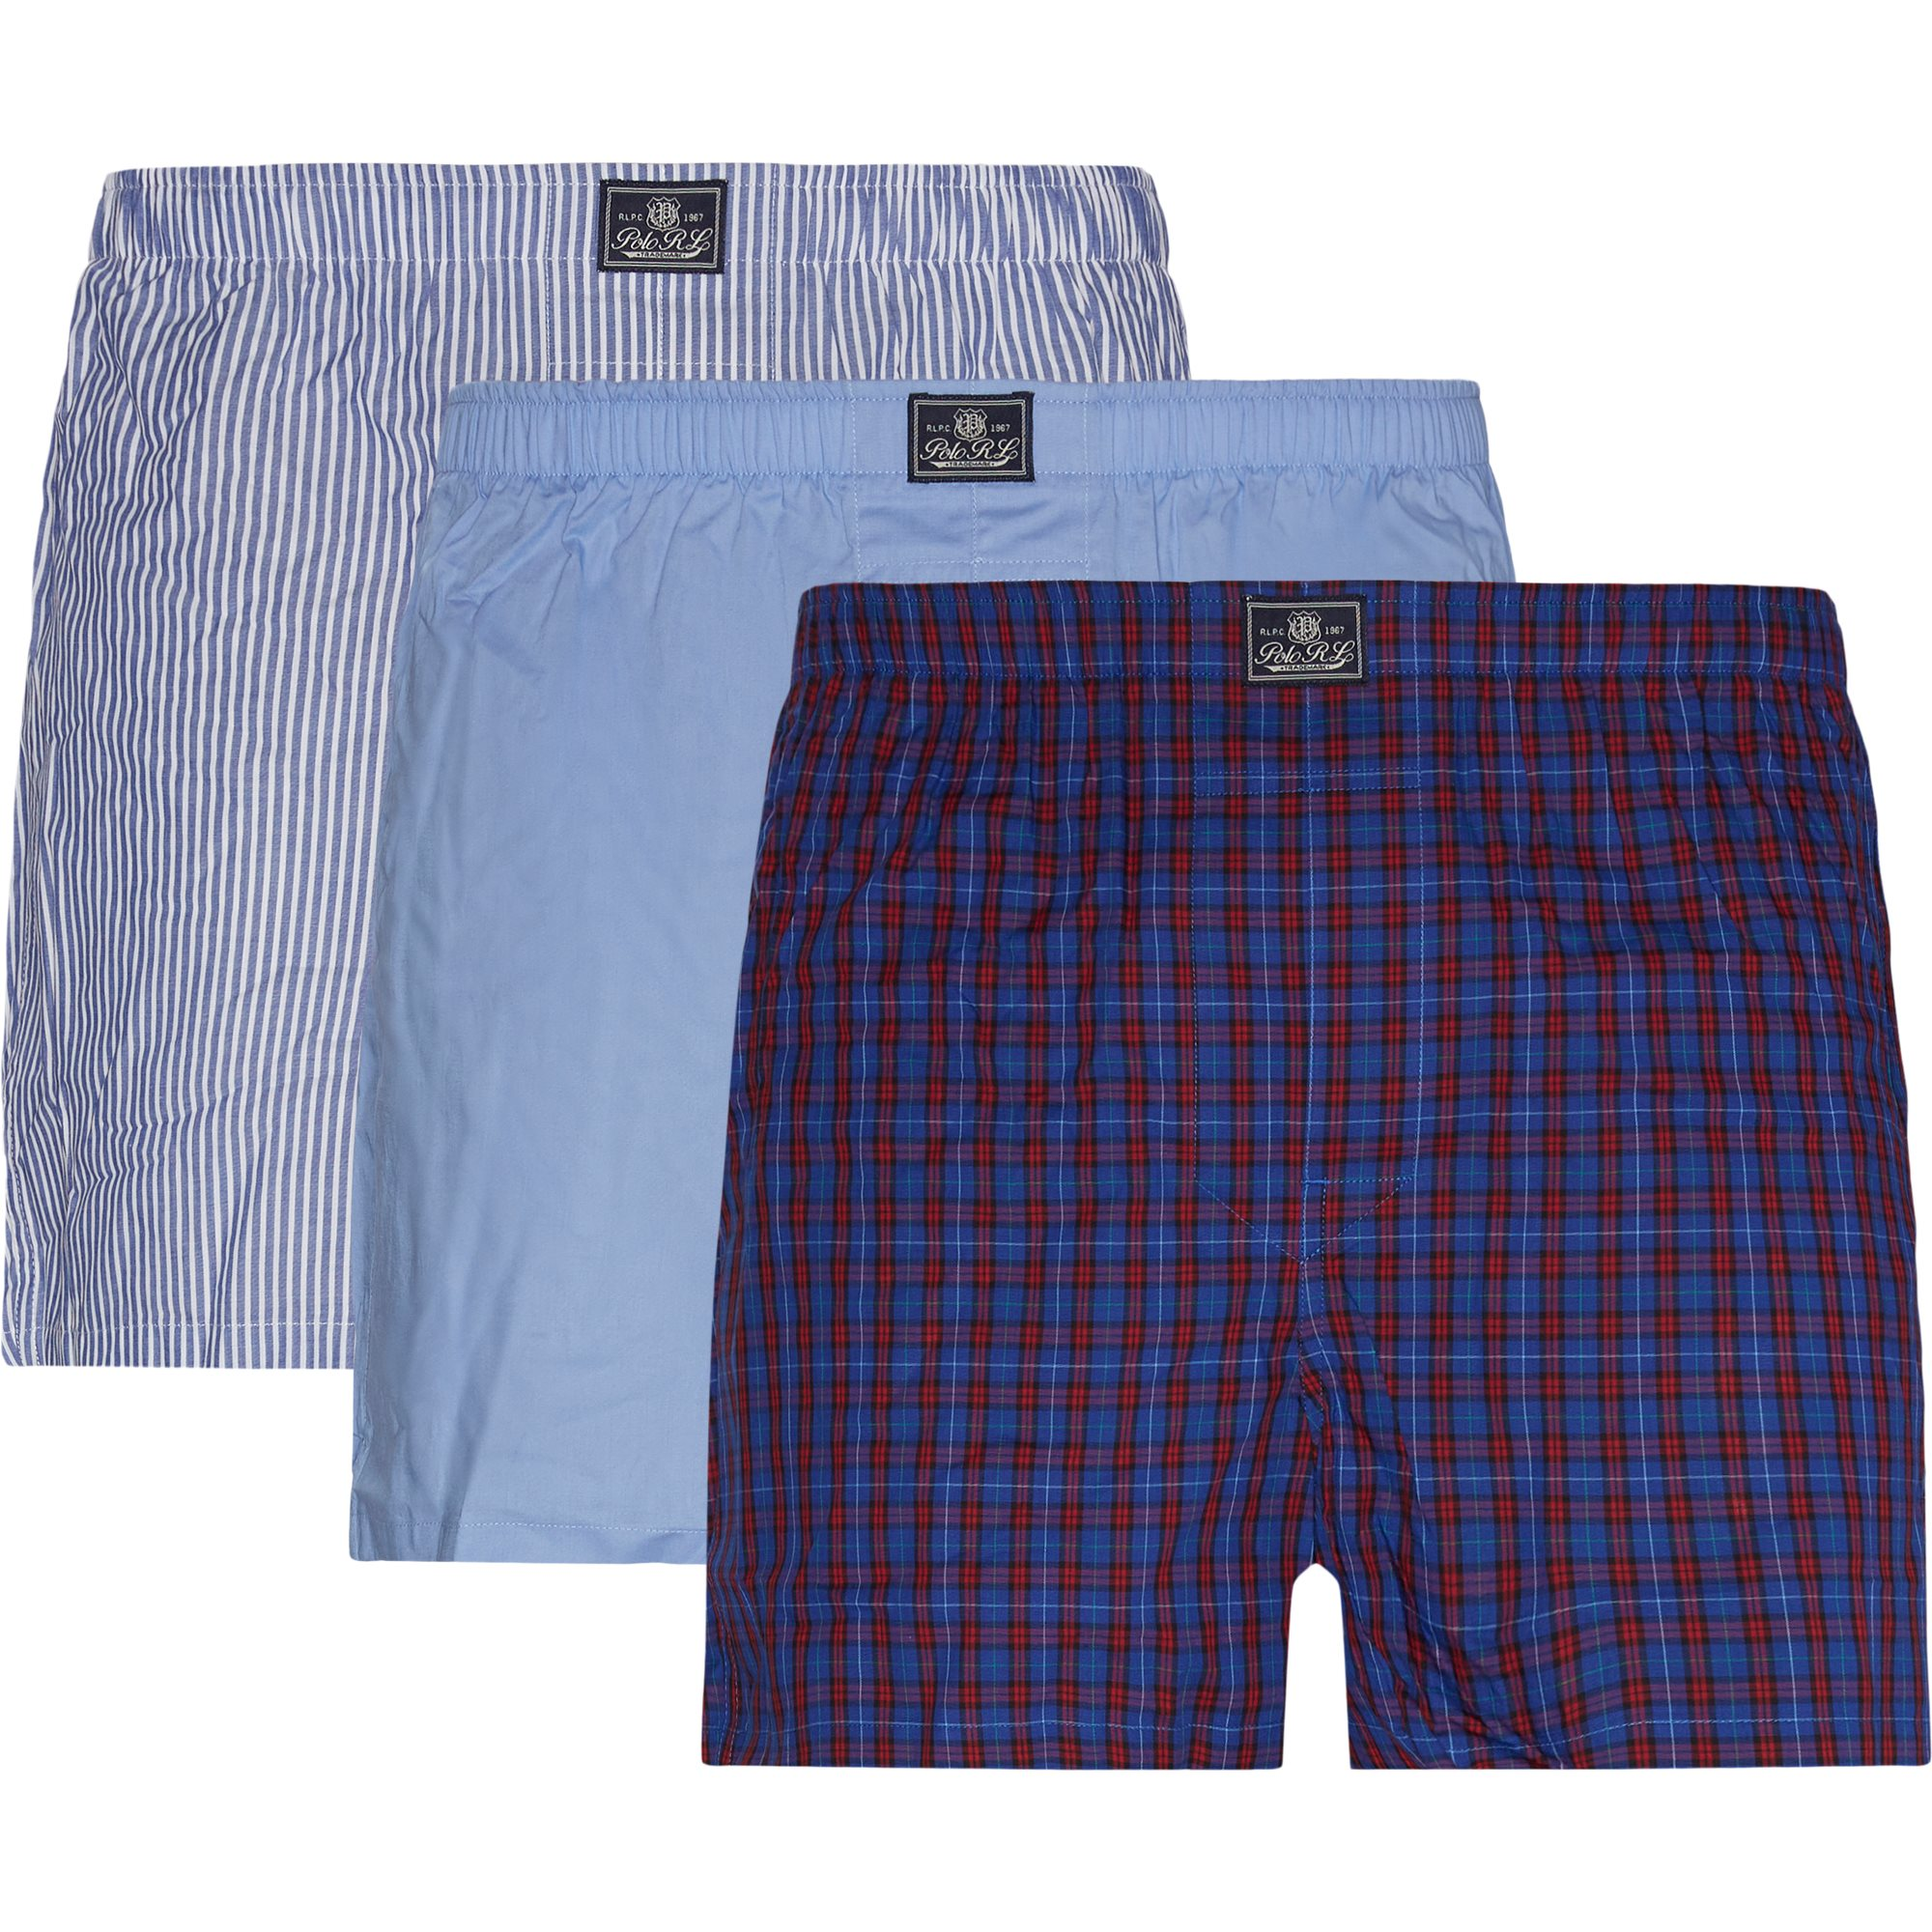 3-Pack Cotton Boxer - Underwear - Multi